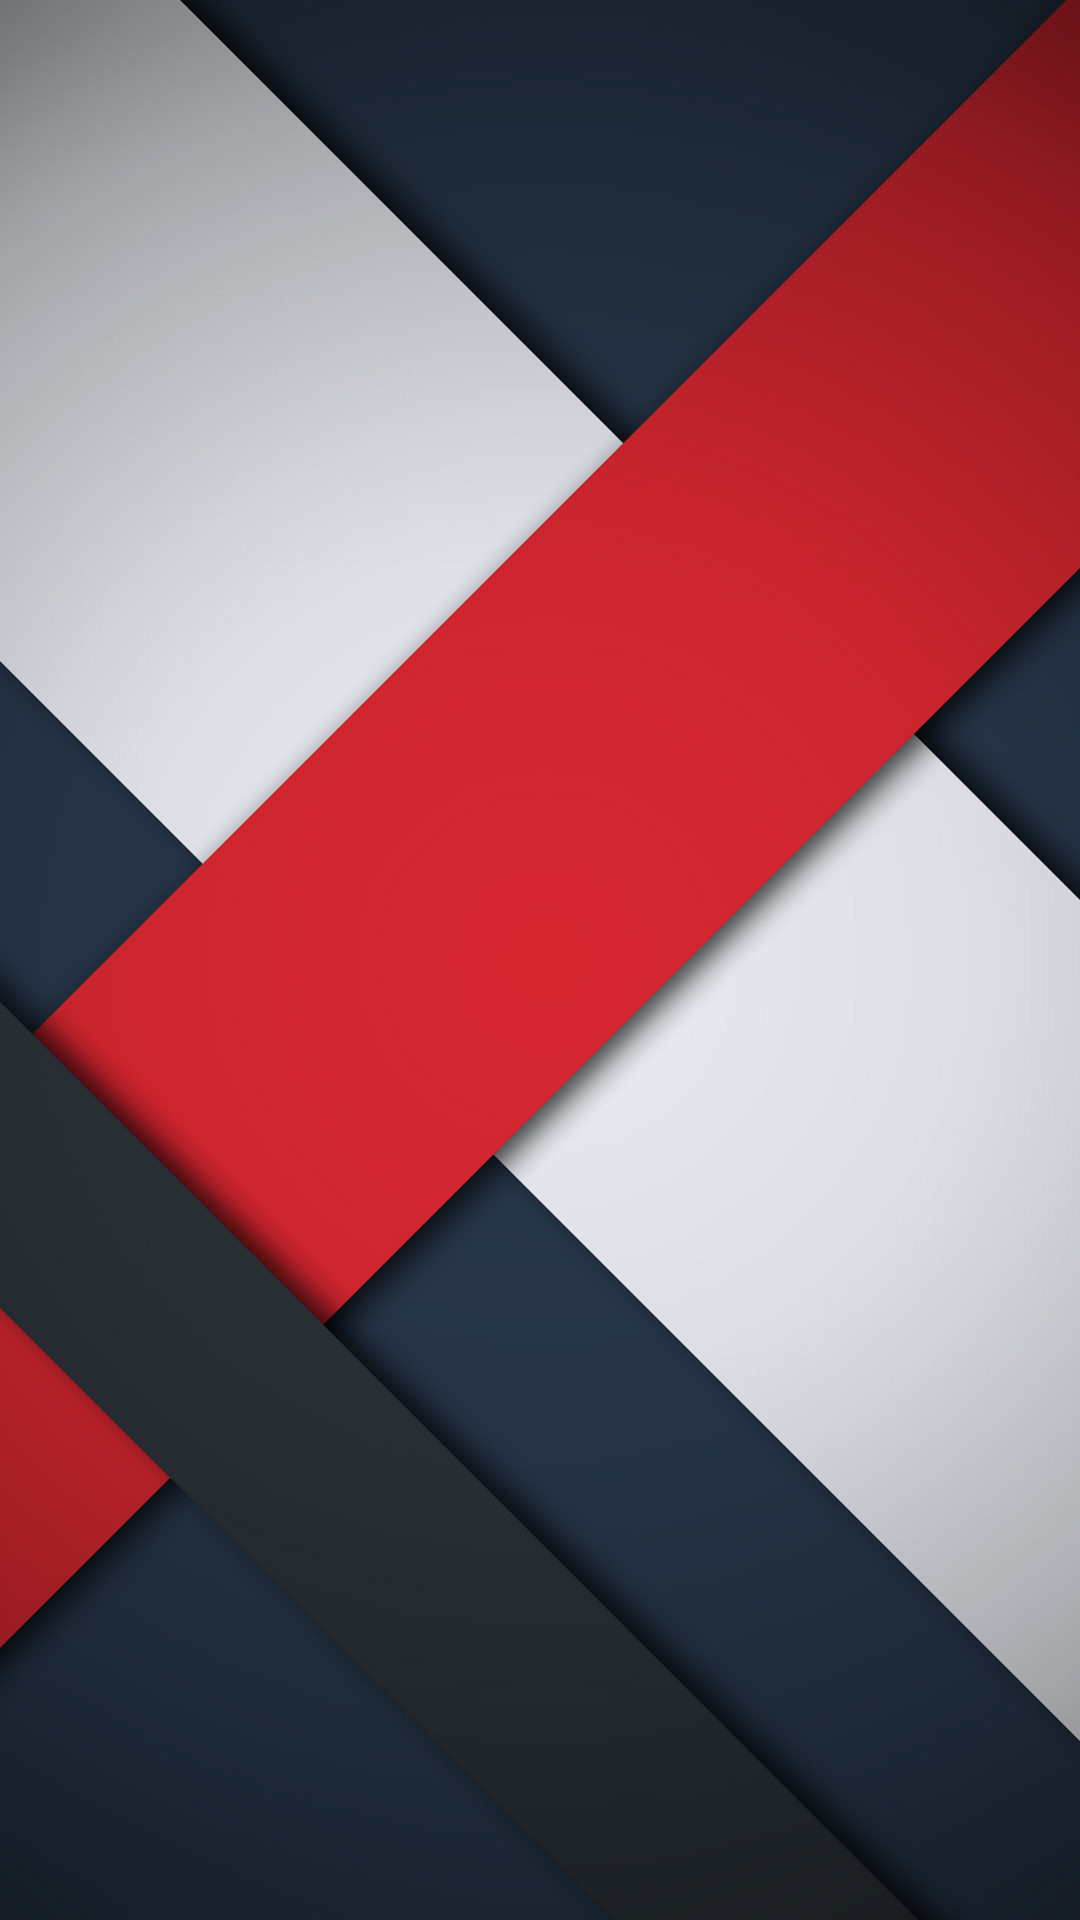 Modern Material Design HD Wallpaper Ideal for Smart Phones.